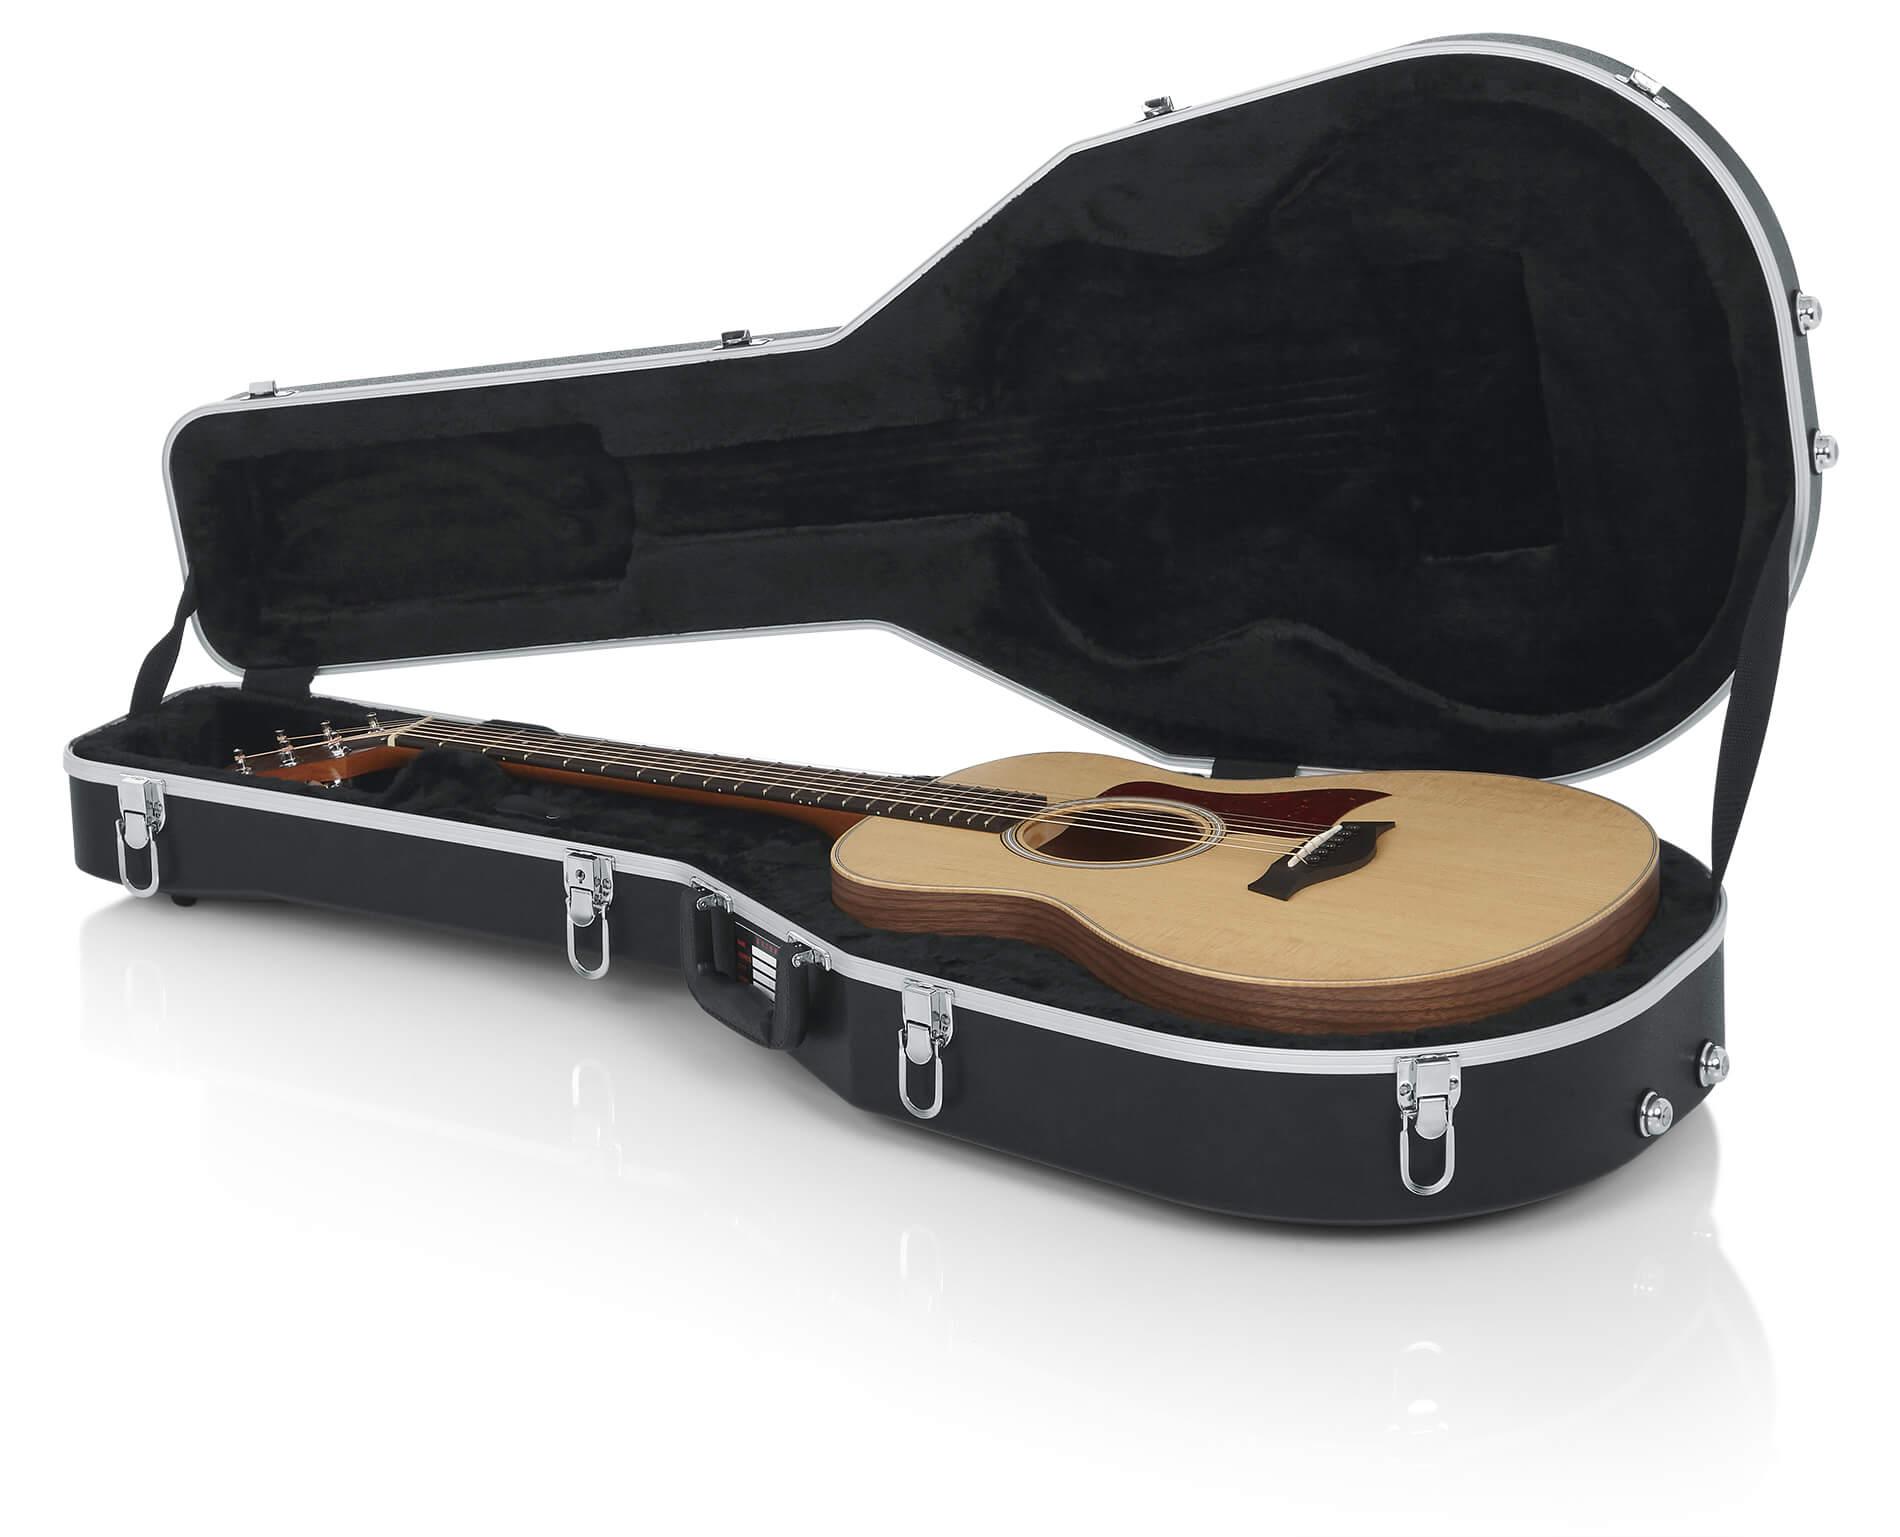 9e222b6e7a Electric Guitar Case-GC-ELECTRIC-A - Gator Cases